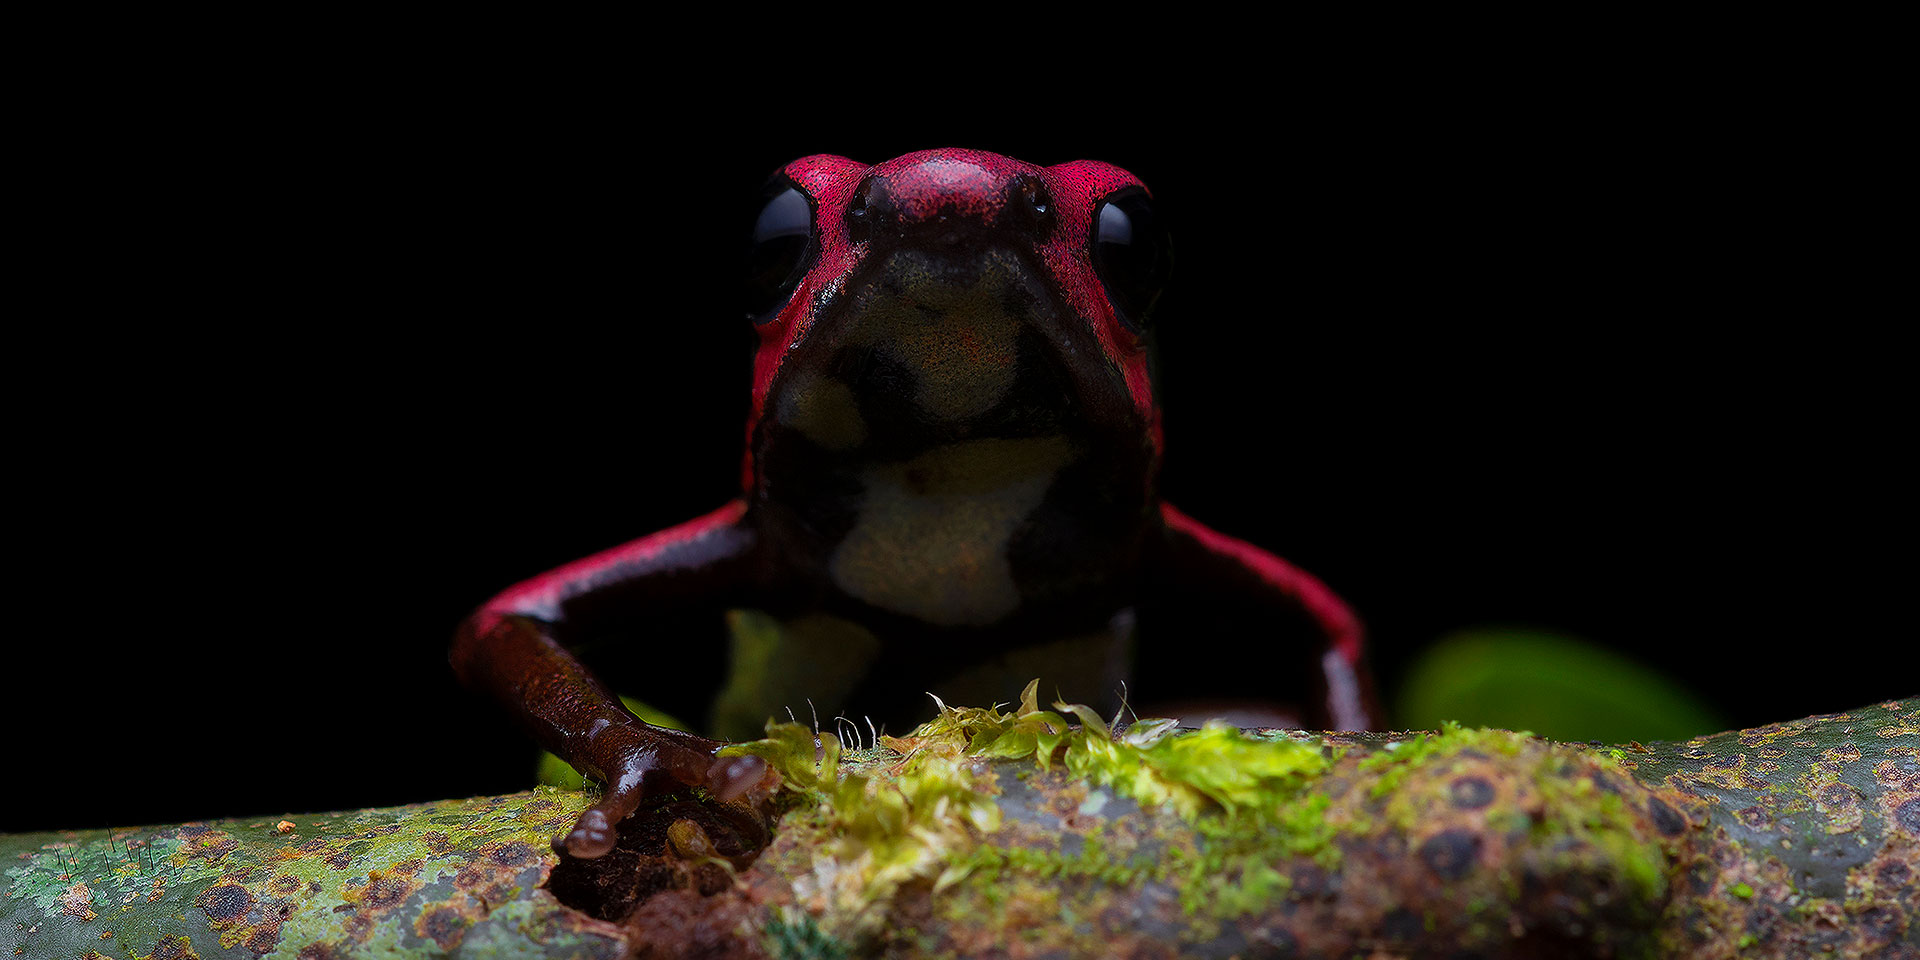 Neoselva-Andinobates-bombetes-Poison-frog-Colombia-Valle-del-Cauca-Dendrobatidae-Herping-Macro-Tour-Web